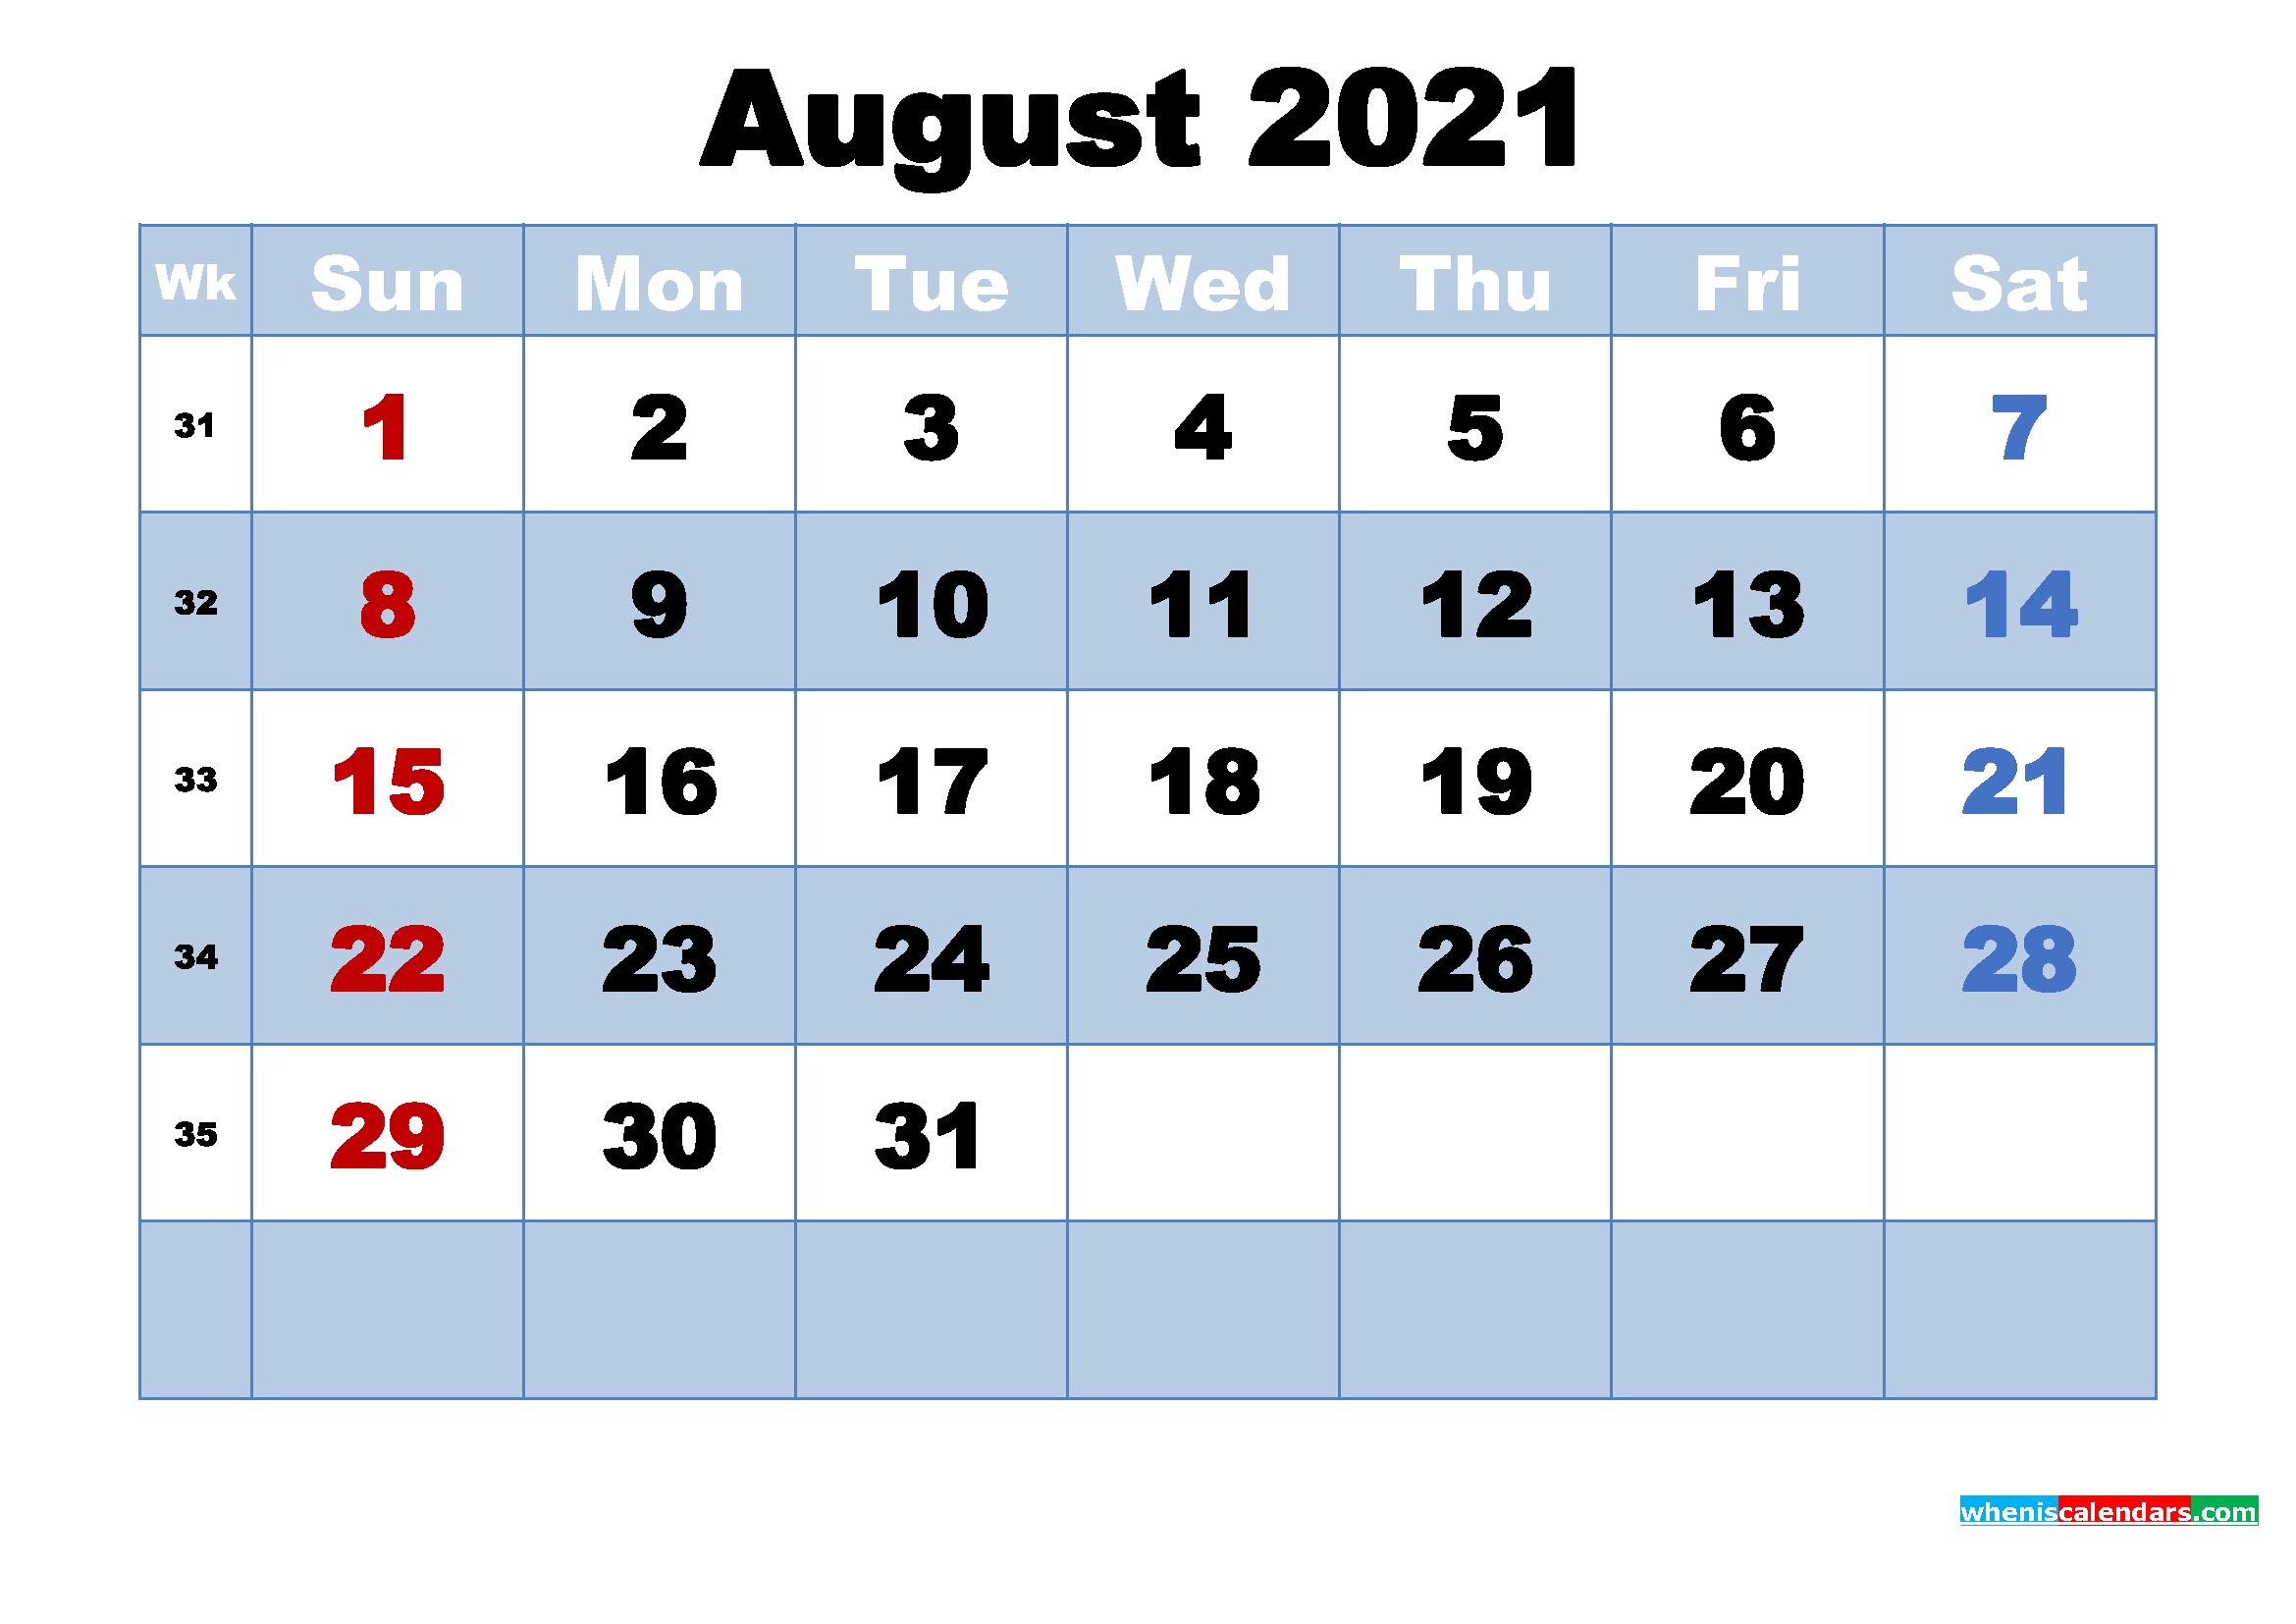 August 2021 Desktop Calendar Monthly